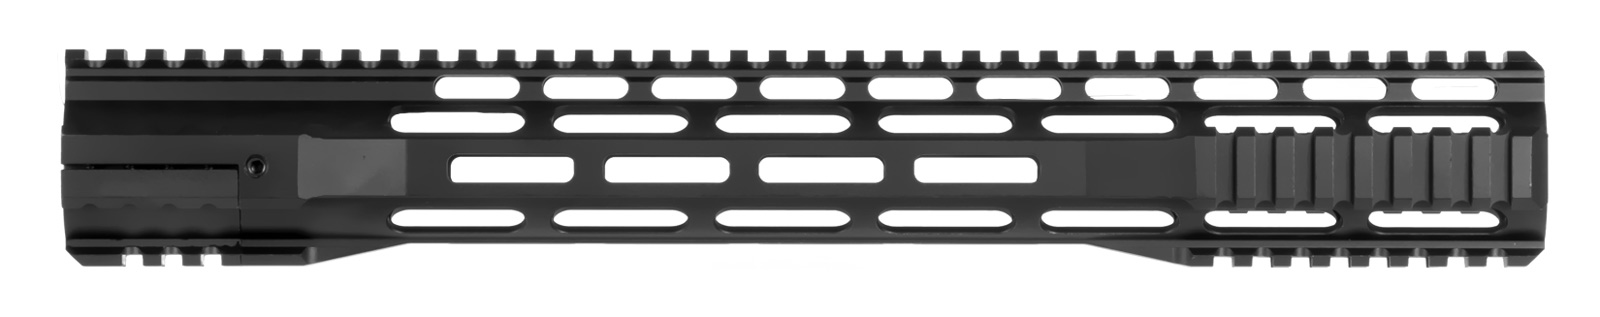 ar-15-rail-15-cbc-arms-keymod-gen-3-ar-15-handguard-rail